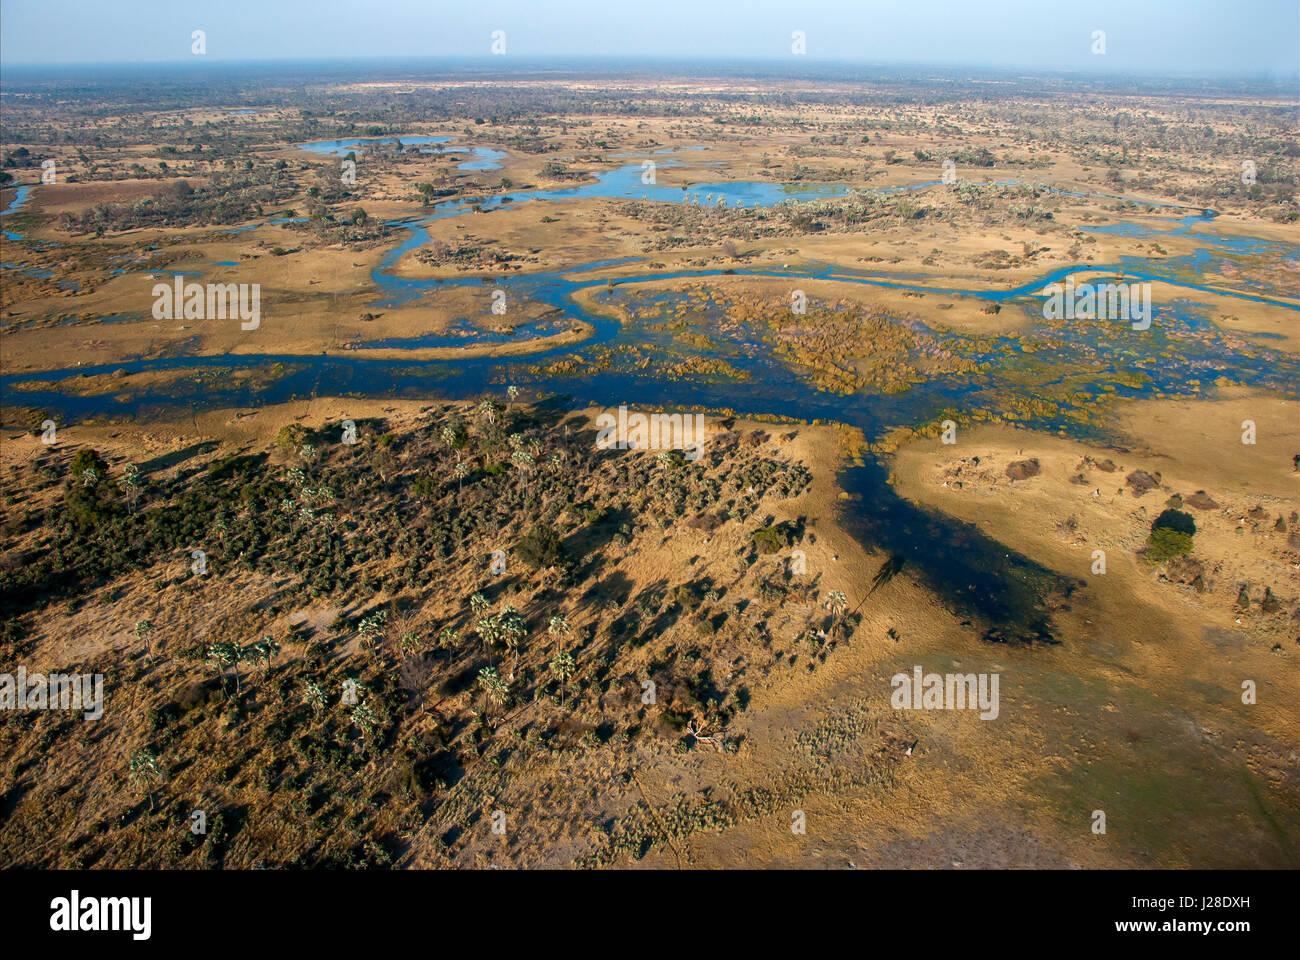 Aerial view of the Okavango Delta, Botswana - Stock Image